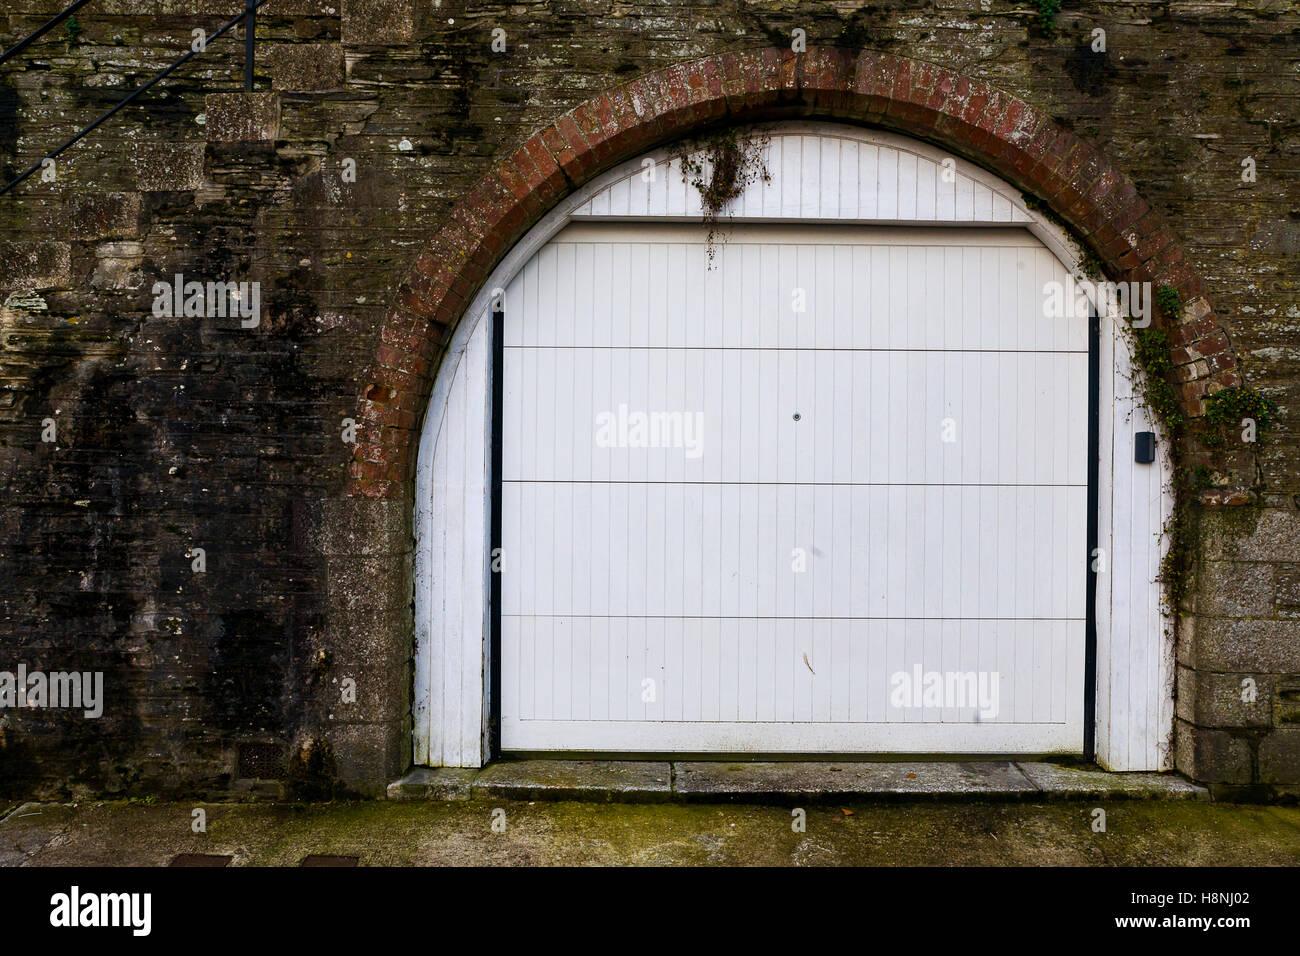 Garage Store Room Built Under Housing - Stock Image